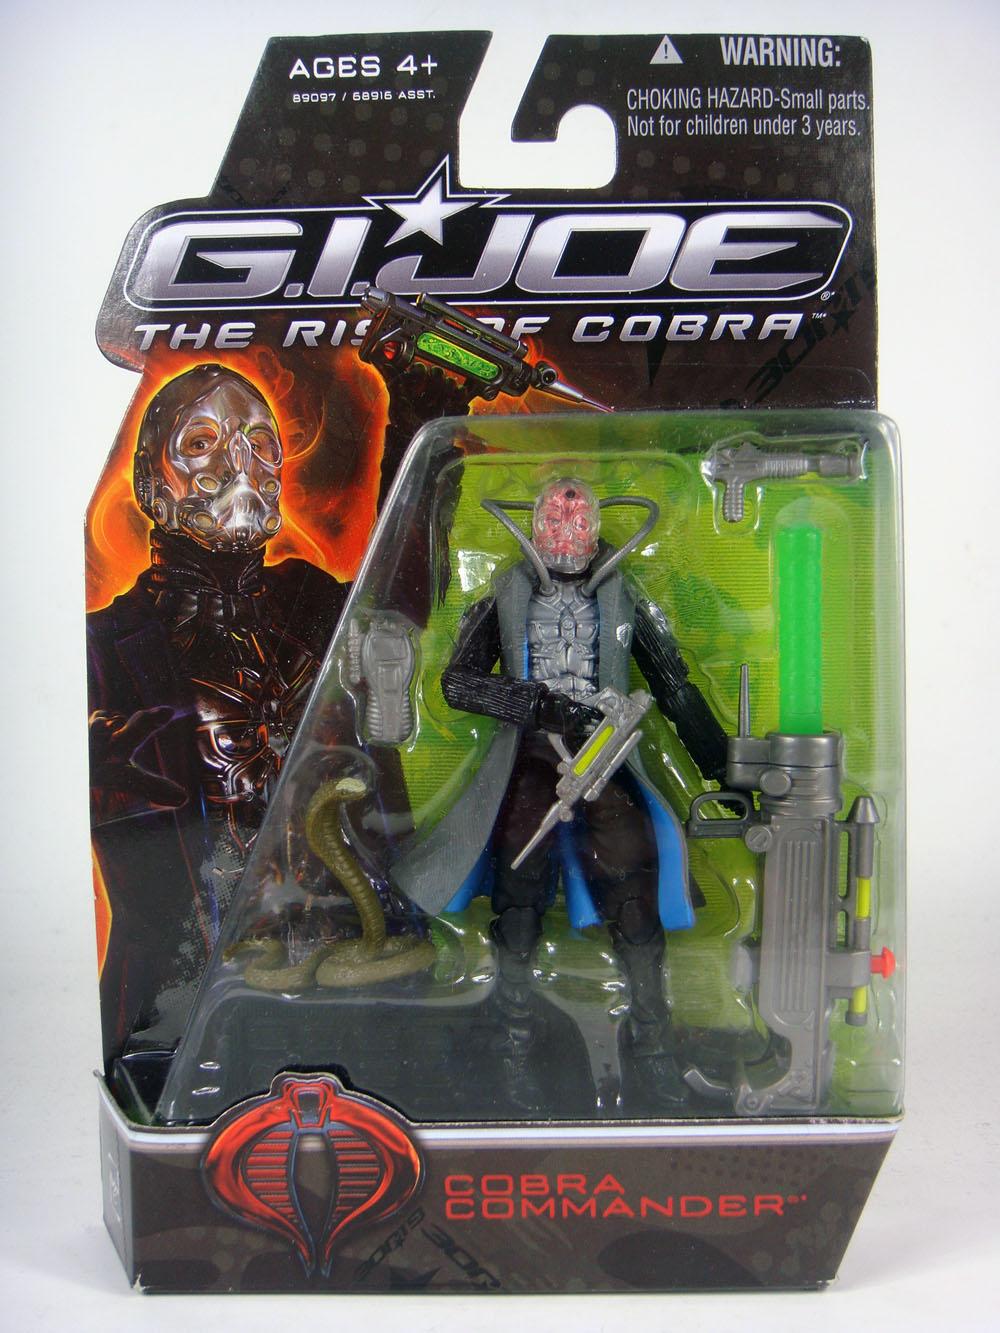 gi joe the rise of cobra�s cobra commander fails